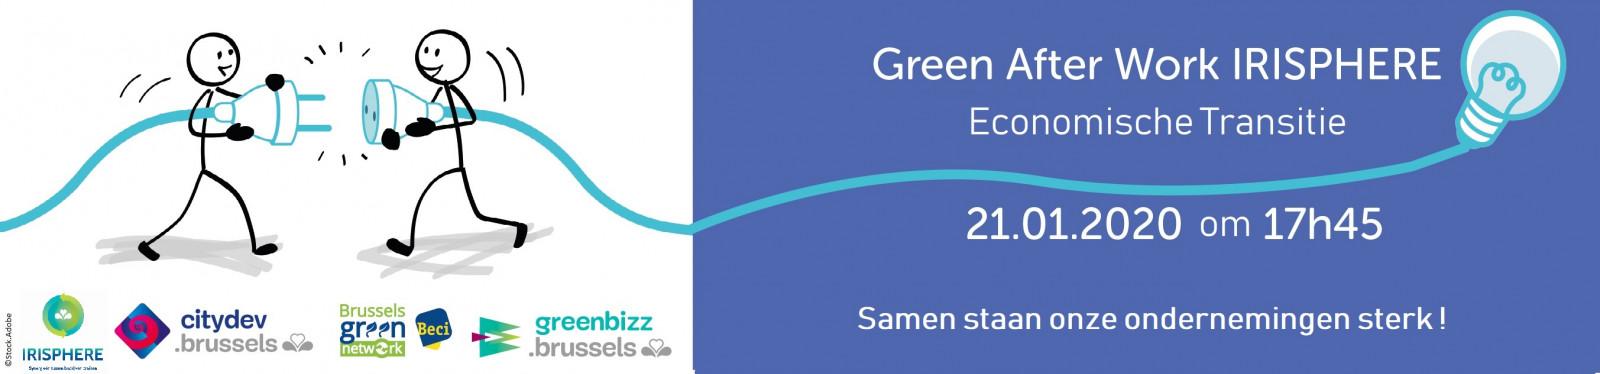 Green After Work Beci x Irisphere: Economische Transitie